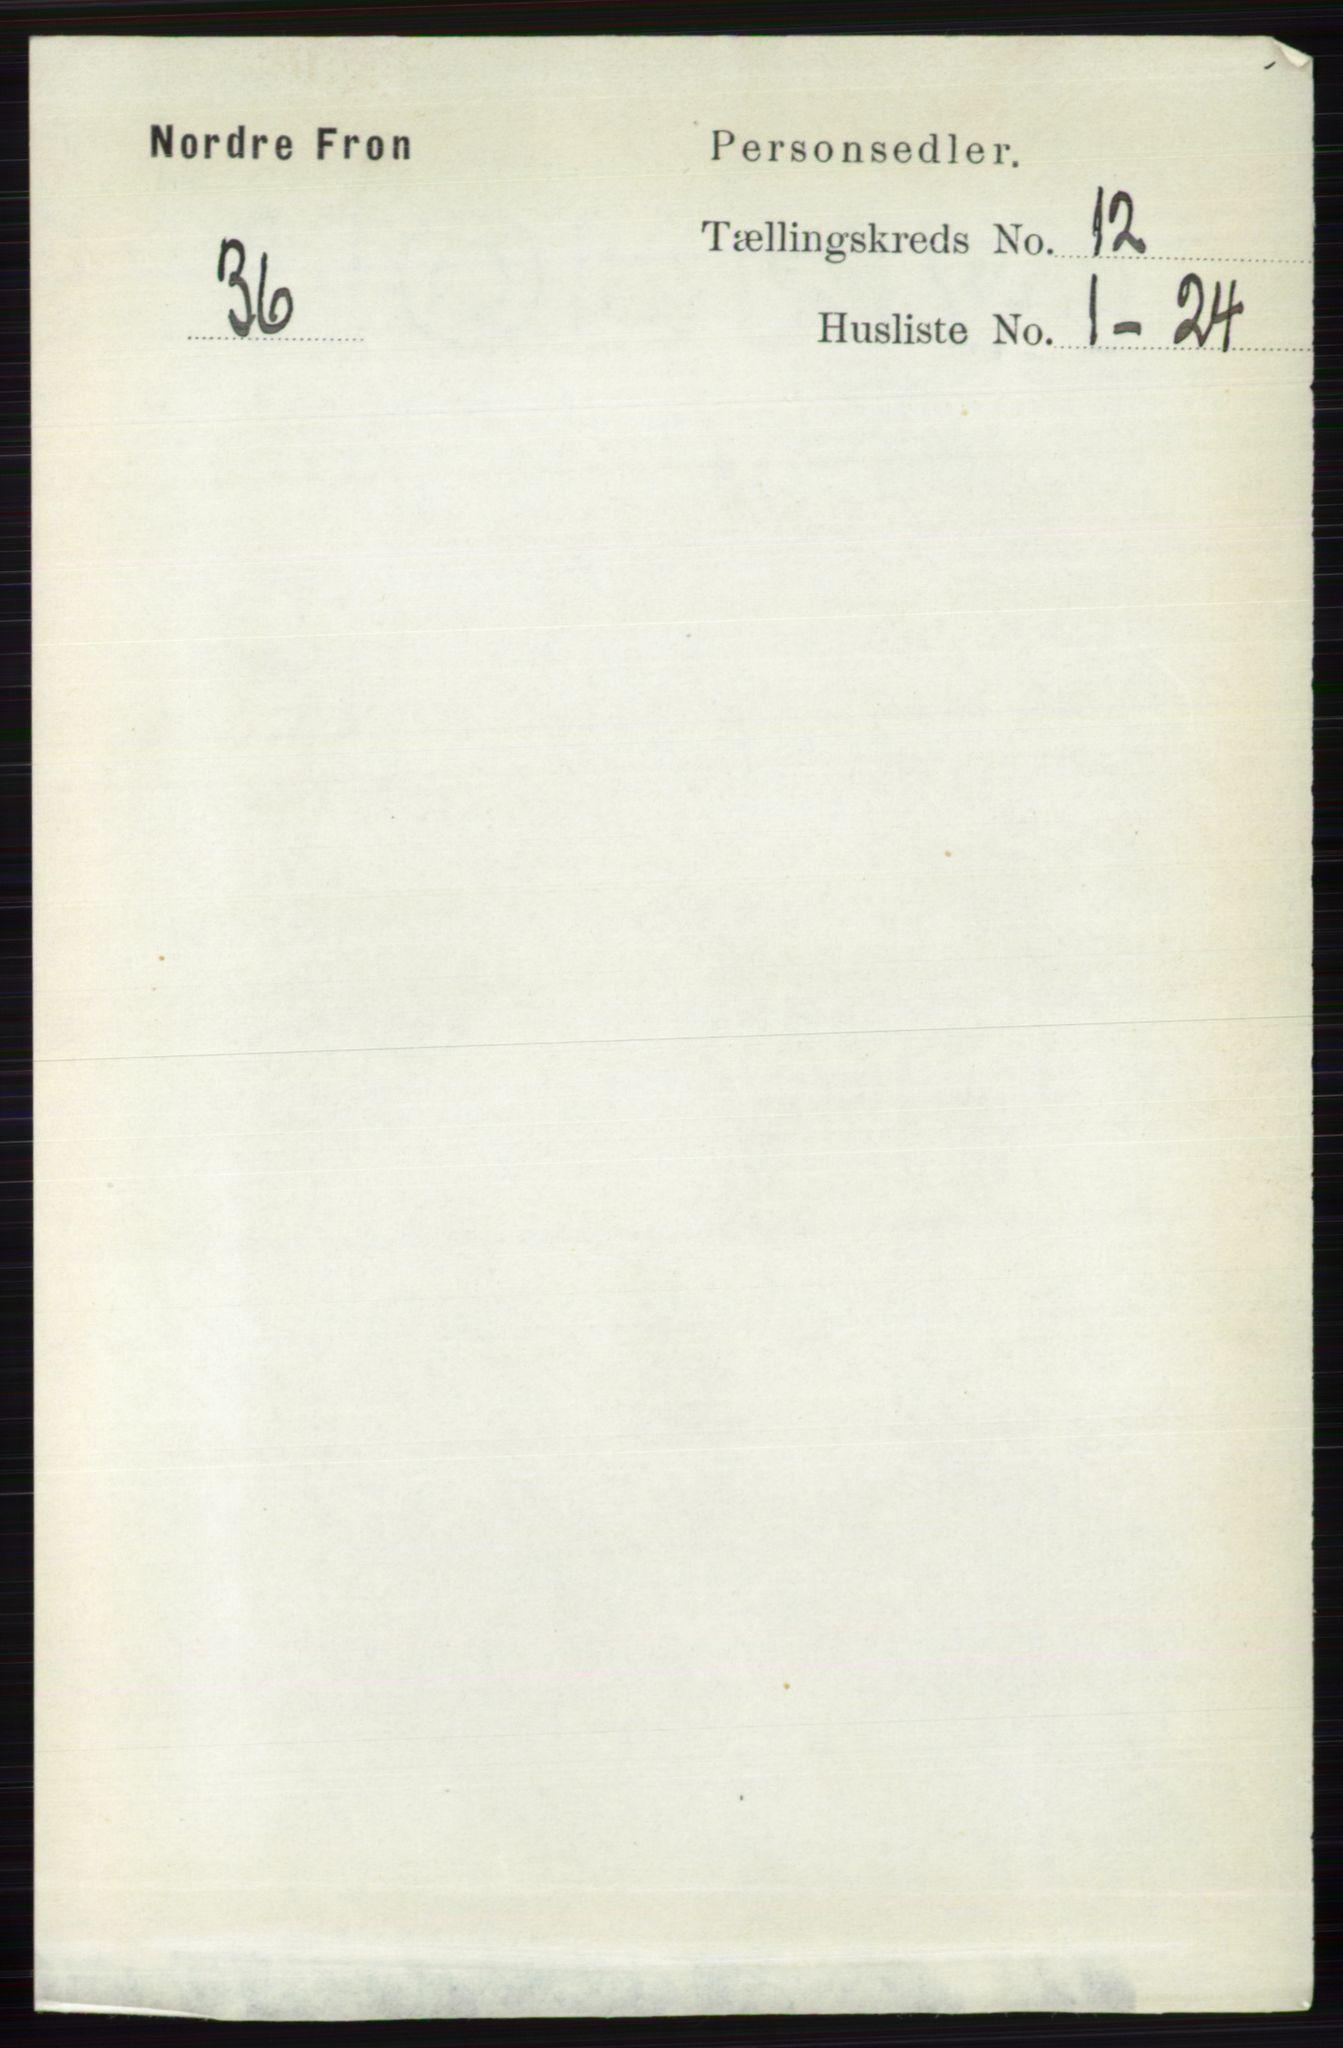 RA, Folketelling 1891 for 0518 Nord-Fron herred, 1891, s. 5105